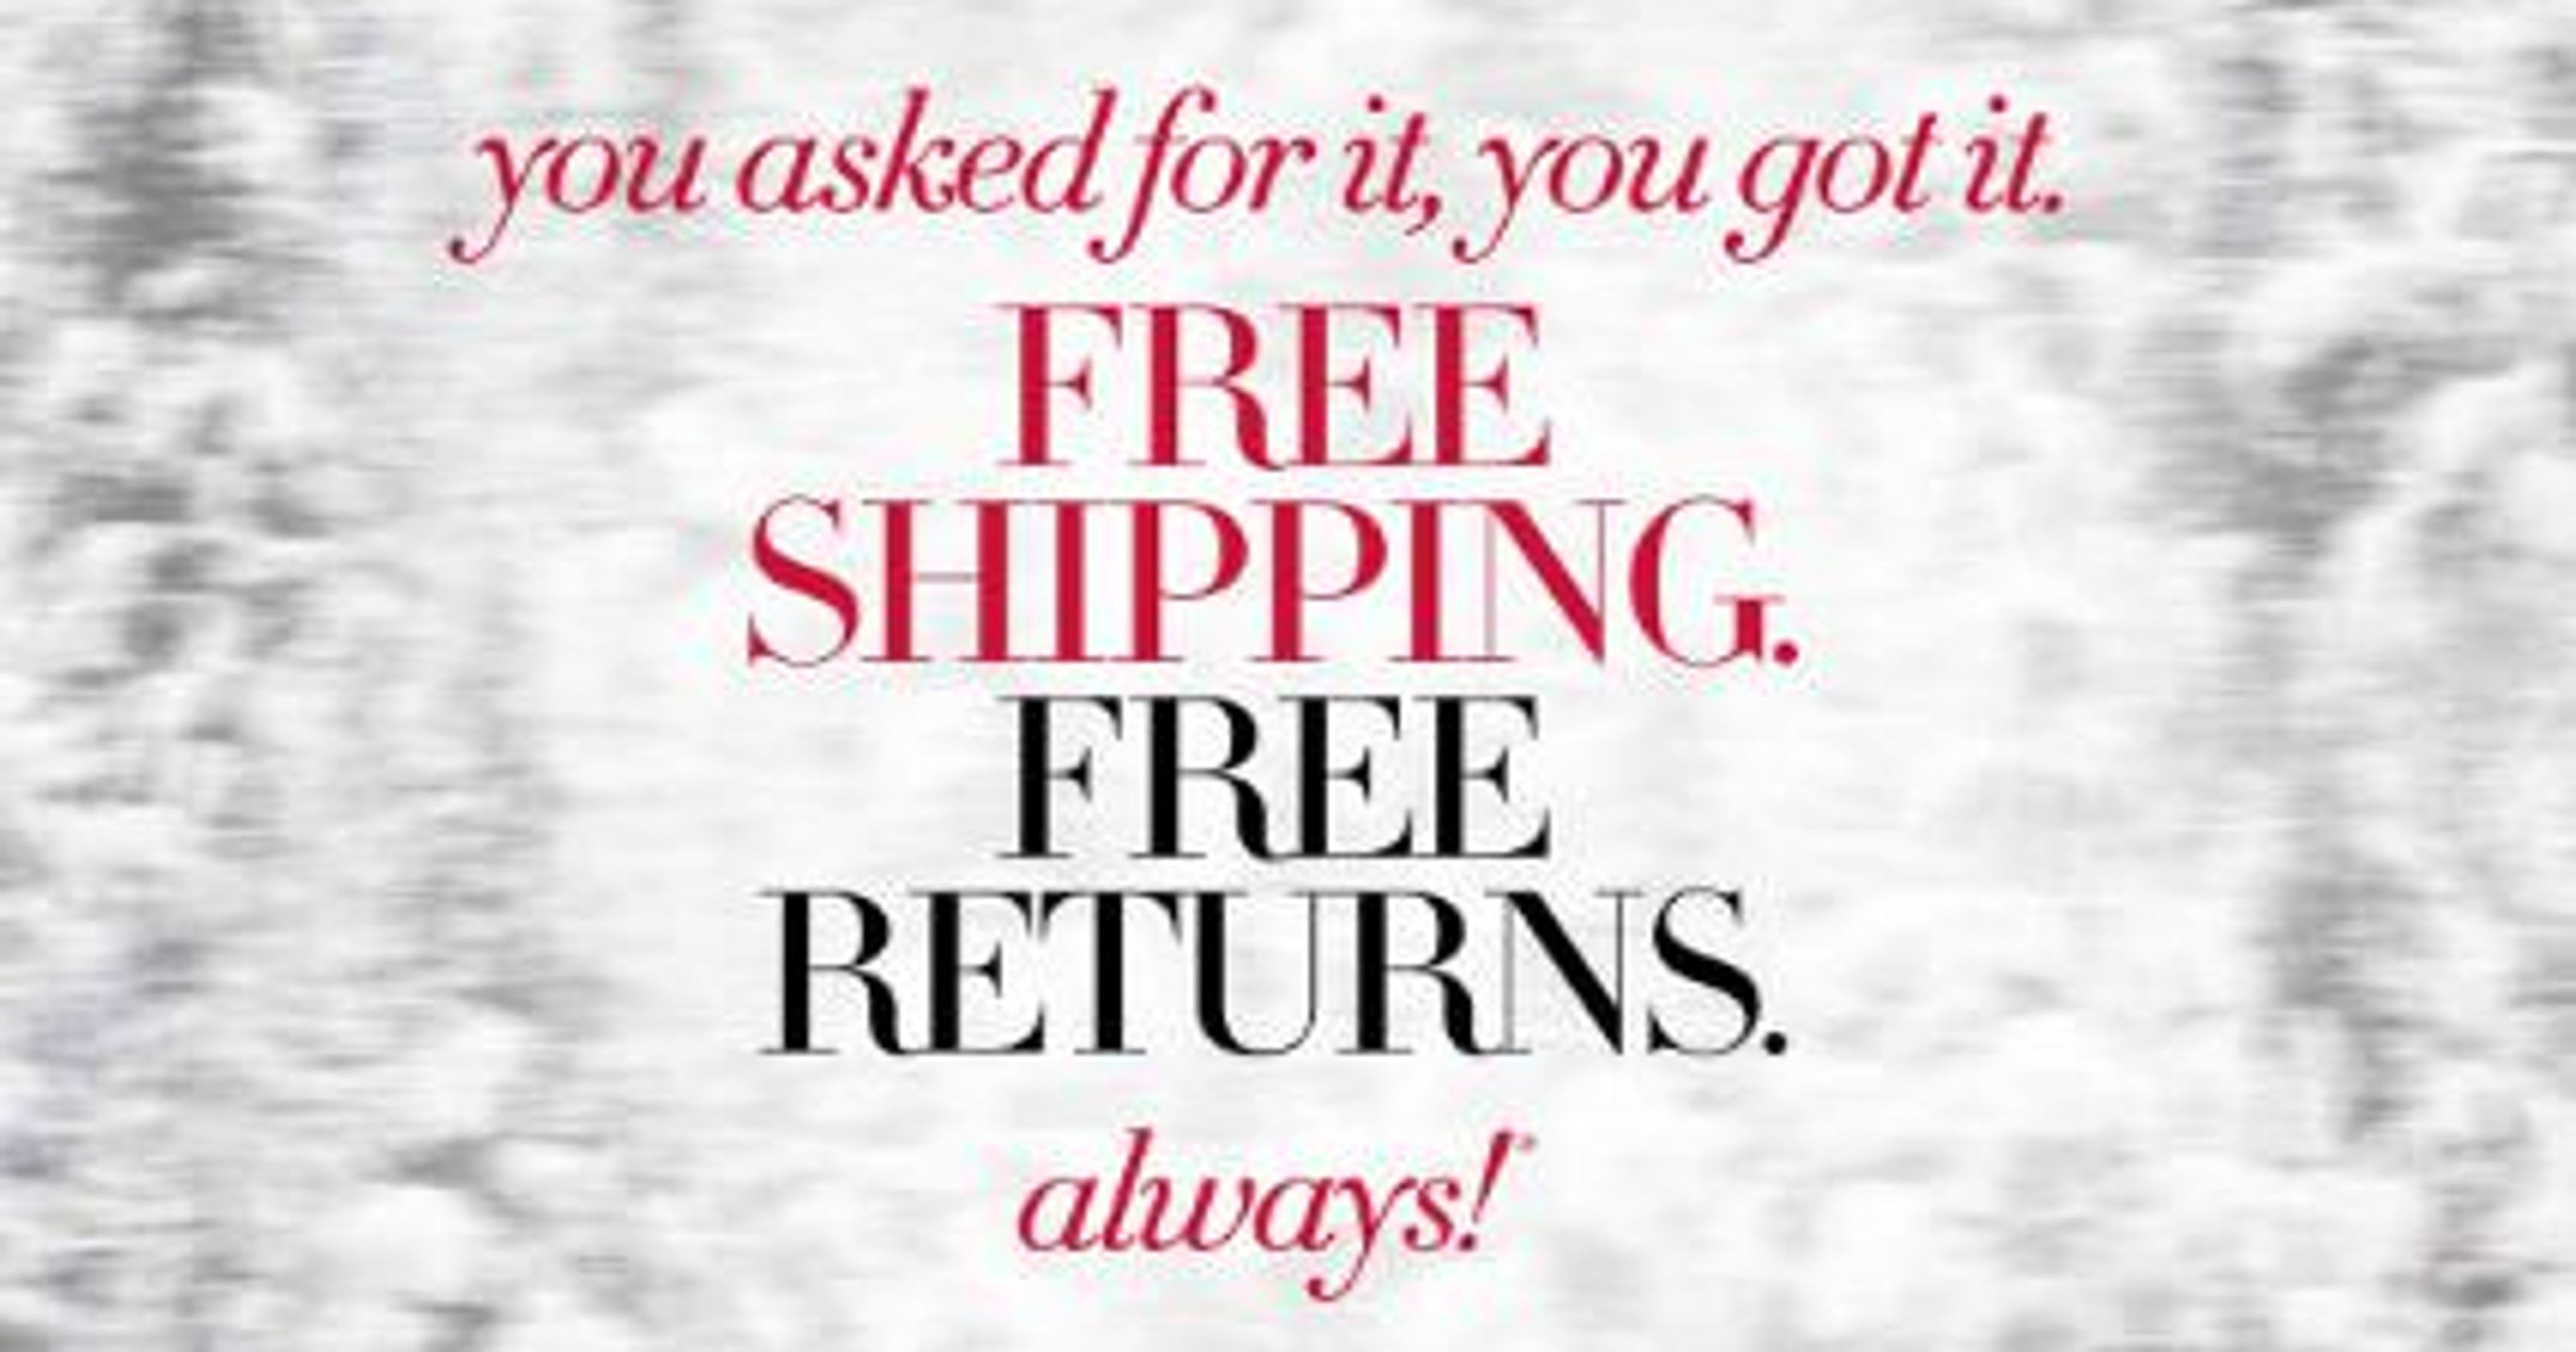 neiman marcus shipping